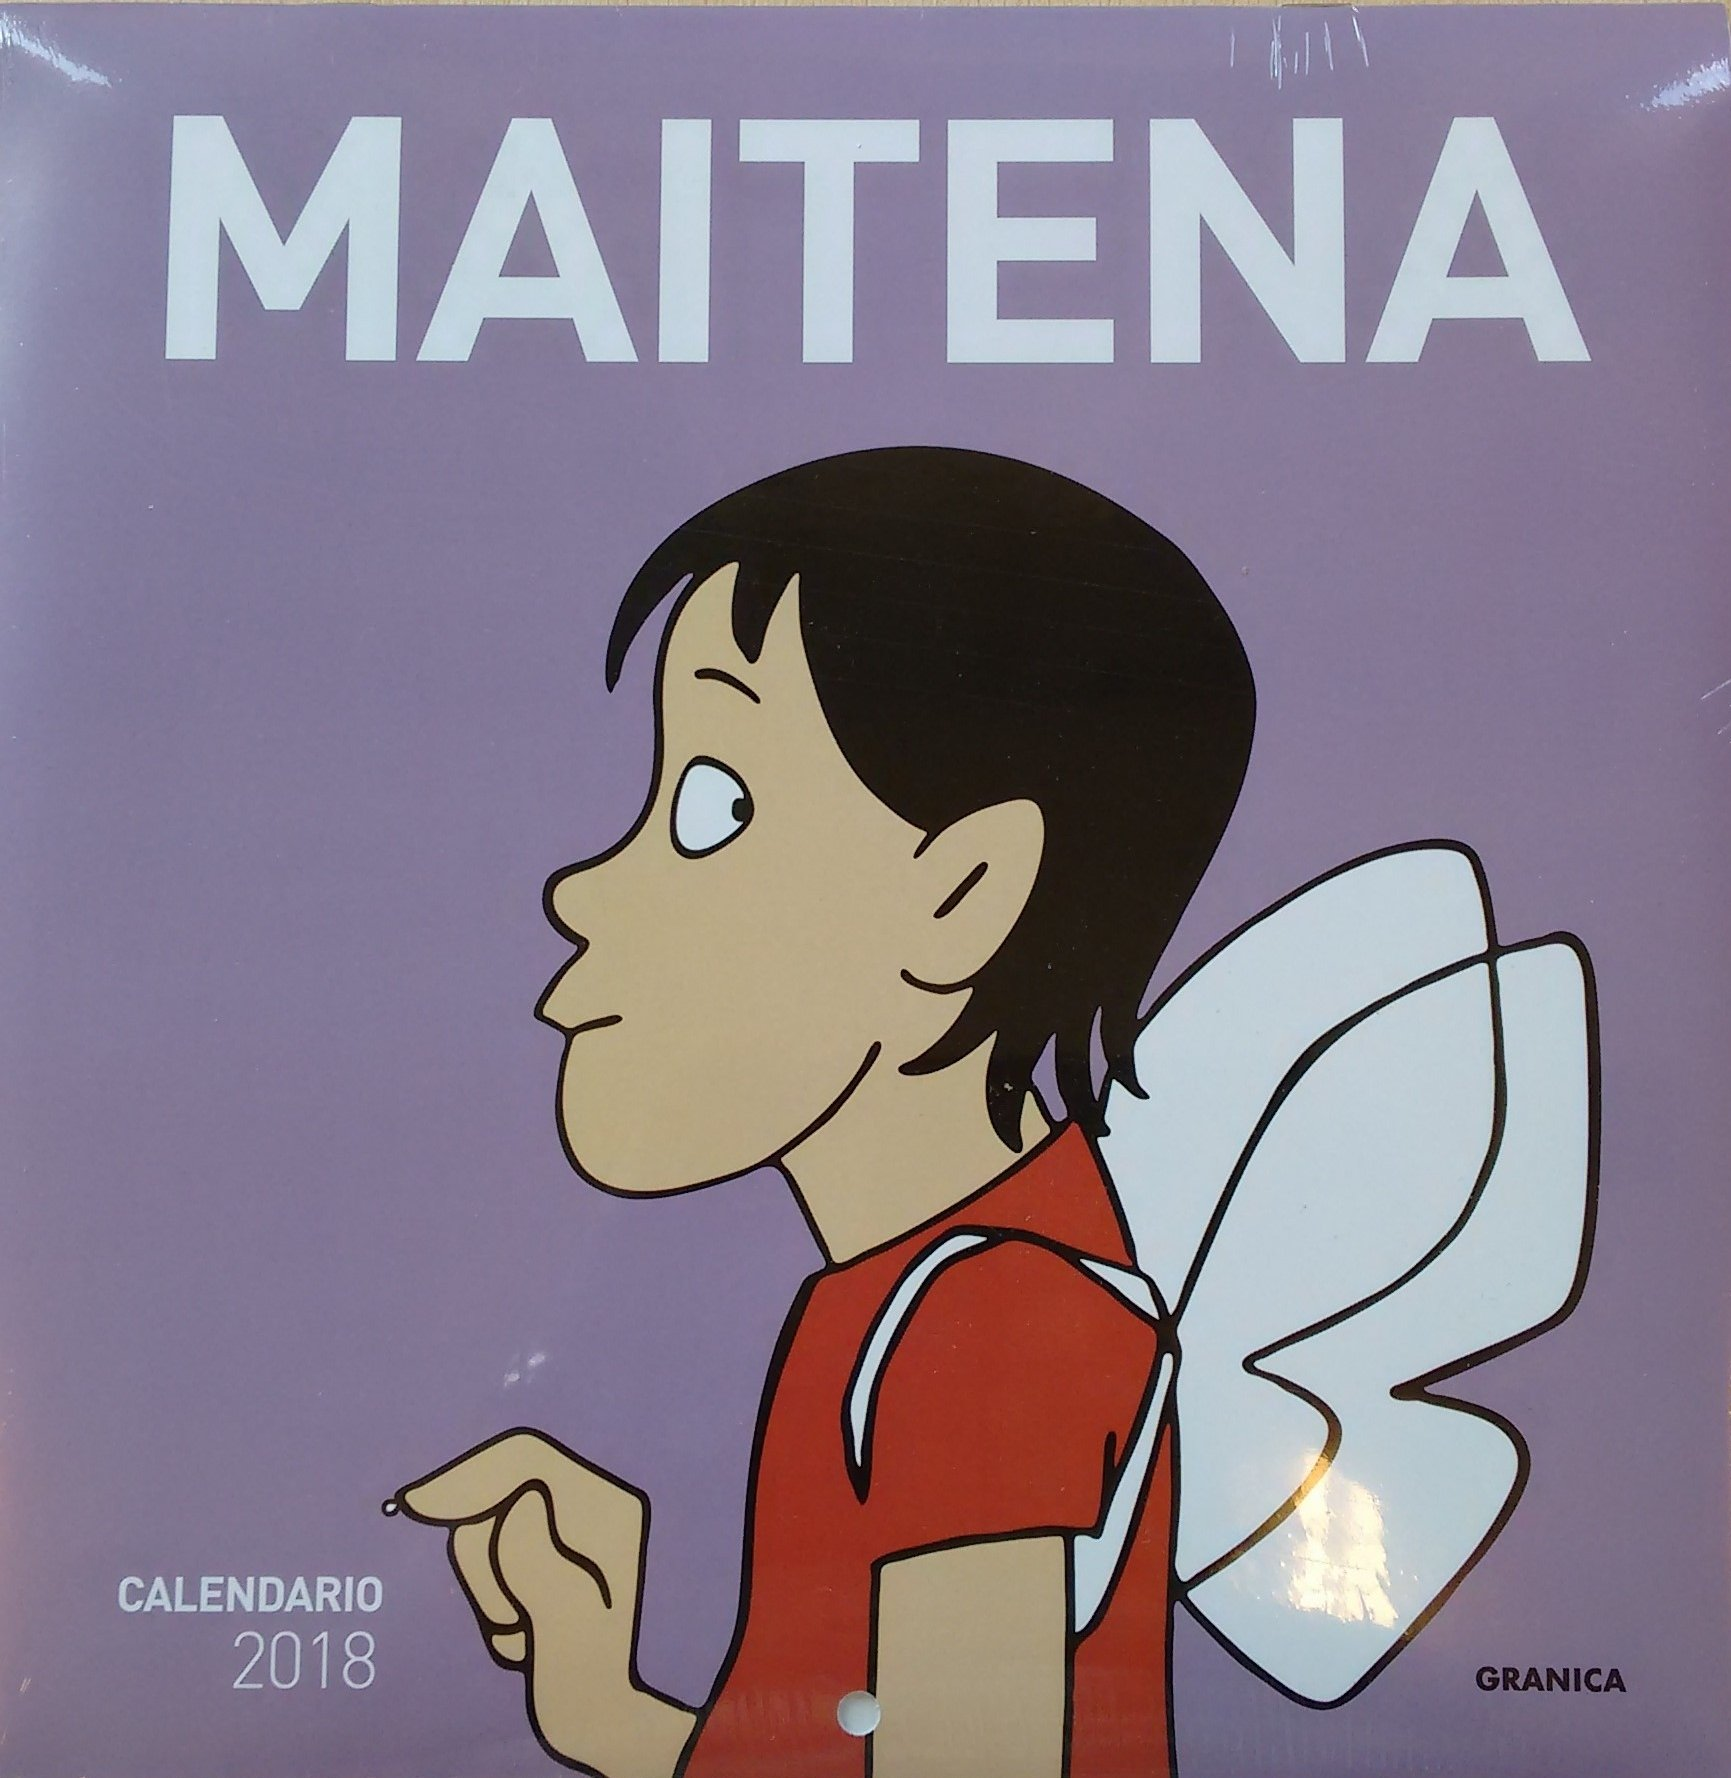 Mafalda 2018 Calendario de pared (Spanish Edition): Maitena ...